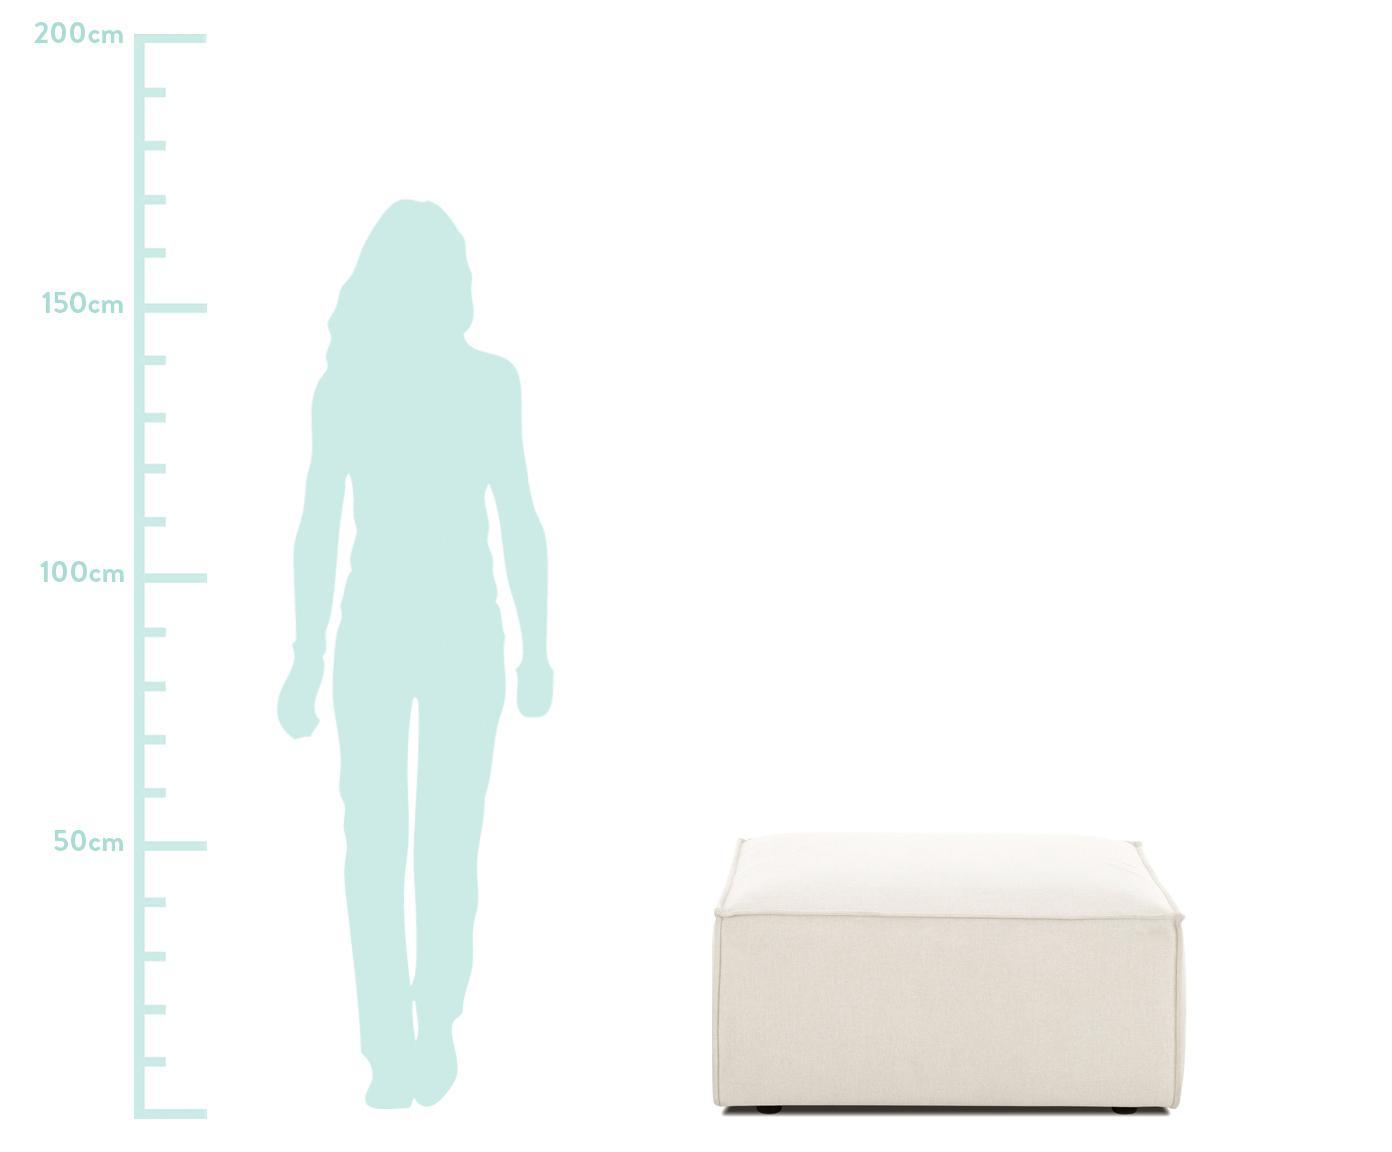 Sofa-Hocker Lennon, Bezug: Polyester Der hochwertige, Gestell: Massives Kiefernholz, Spe, Füße: Kunststoff, Webstoff Beige, 88 x 43 cm